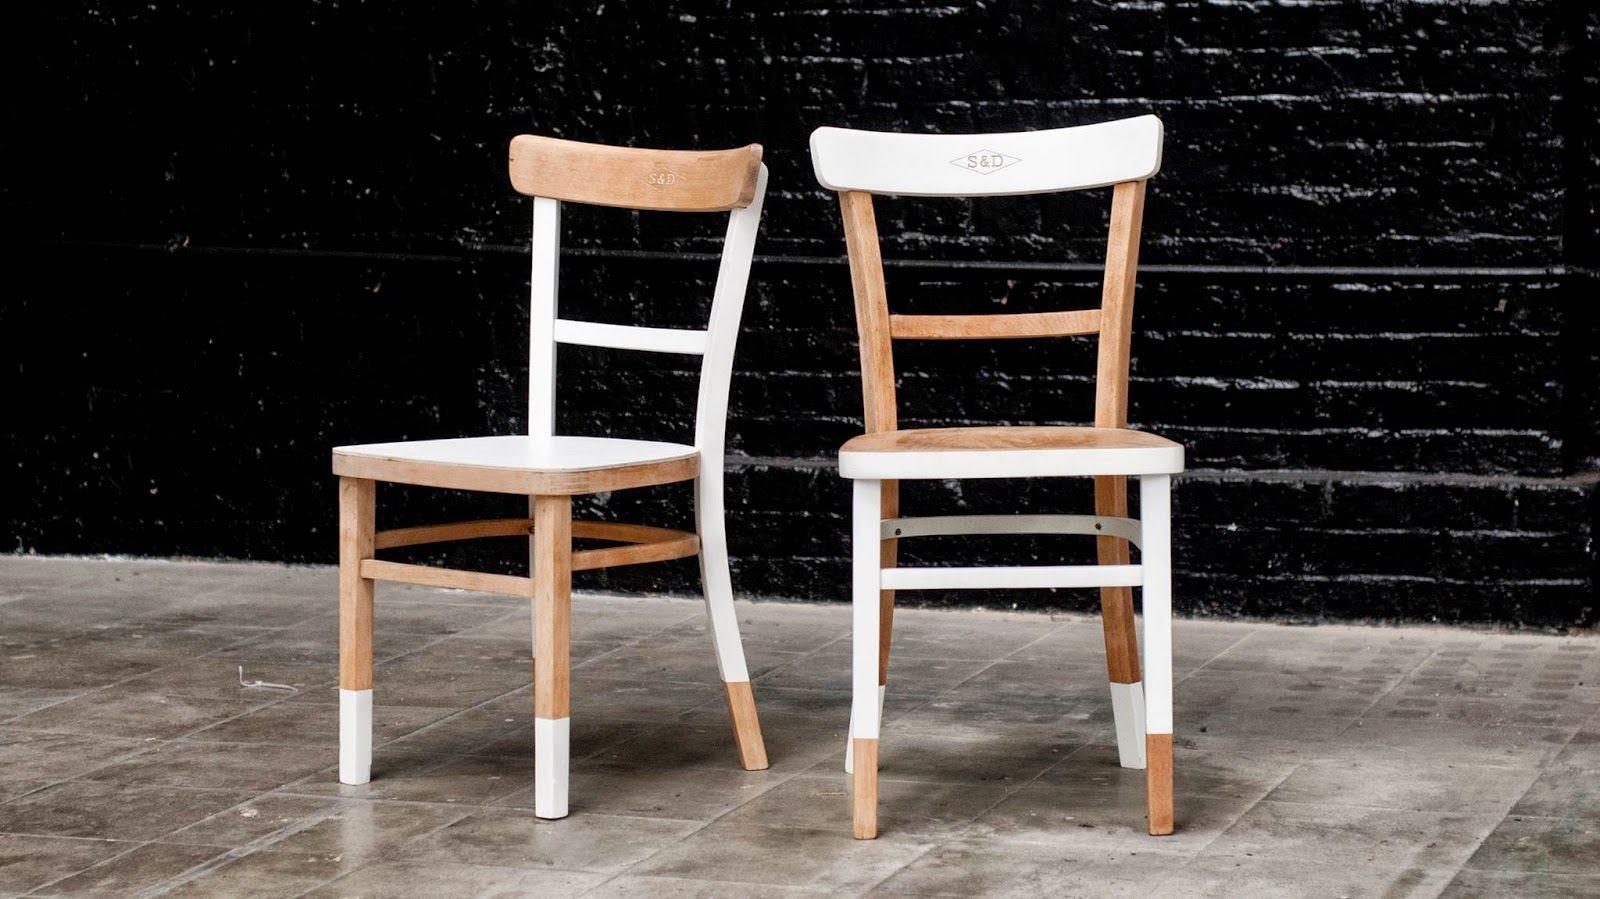 Sabrac Darak Bistro Chairs Natural And White Painting Carved Wood On The Back Chaises De Bistrot Peinture Blanche Sur Bois Naturel Dossier Grave Au Nom De S